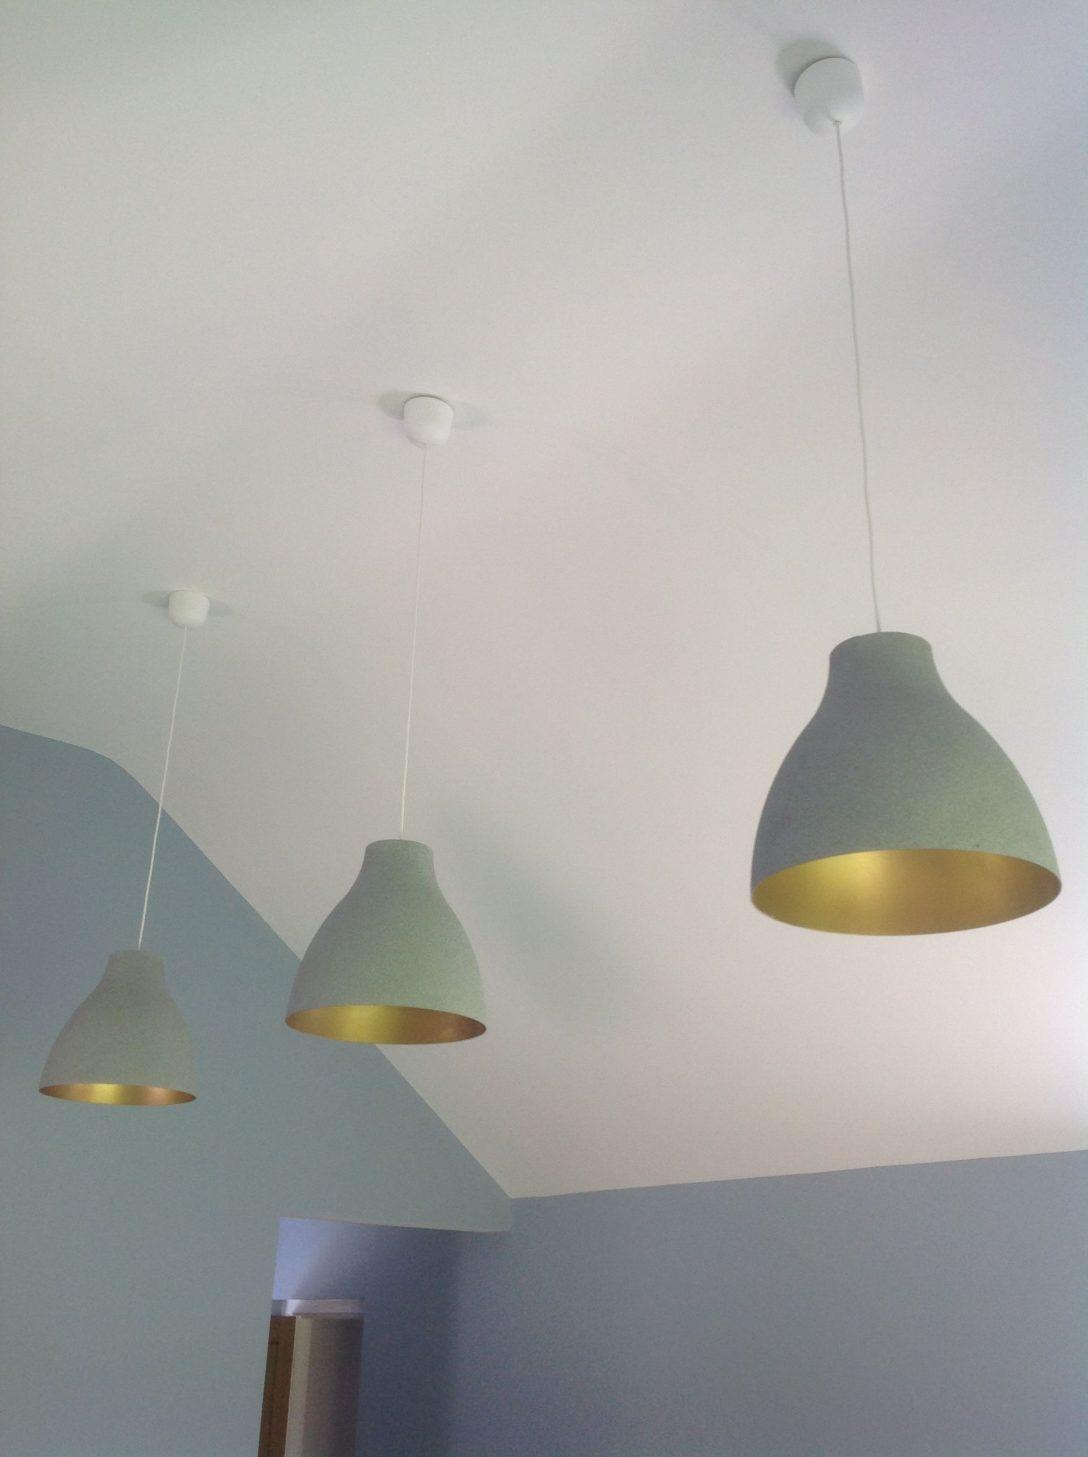 Large Size of Küchenlampen Ikea Hack Melodi White Plastic Lampshades Transformed Wohnzimmer Küchenlampen